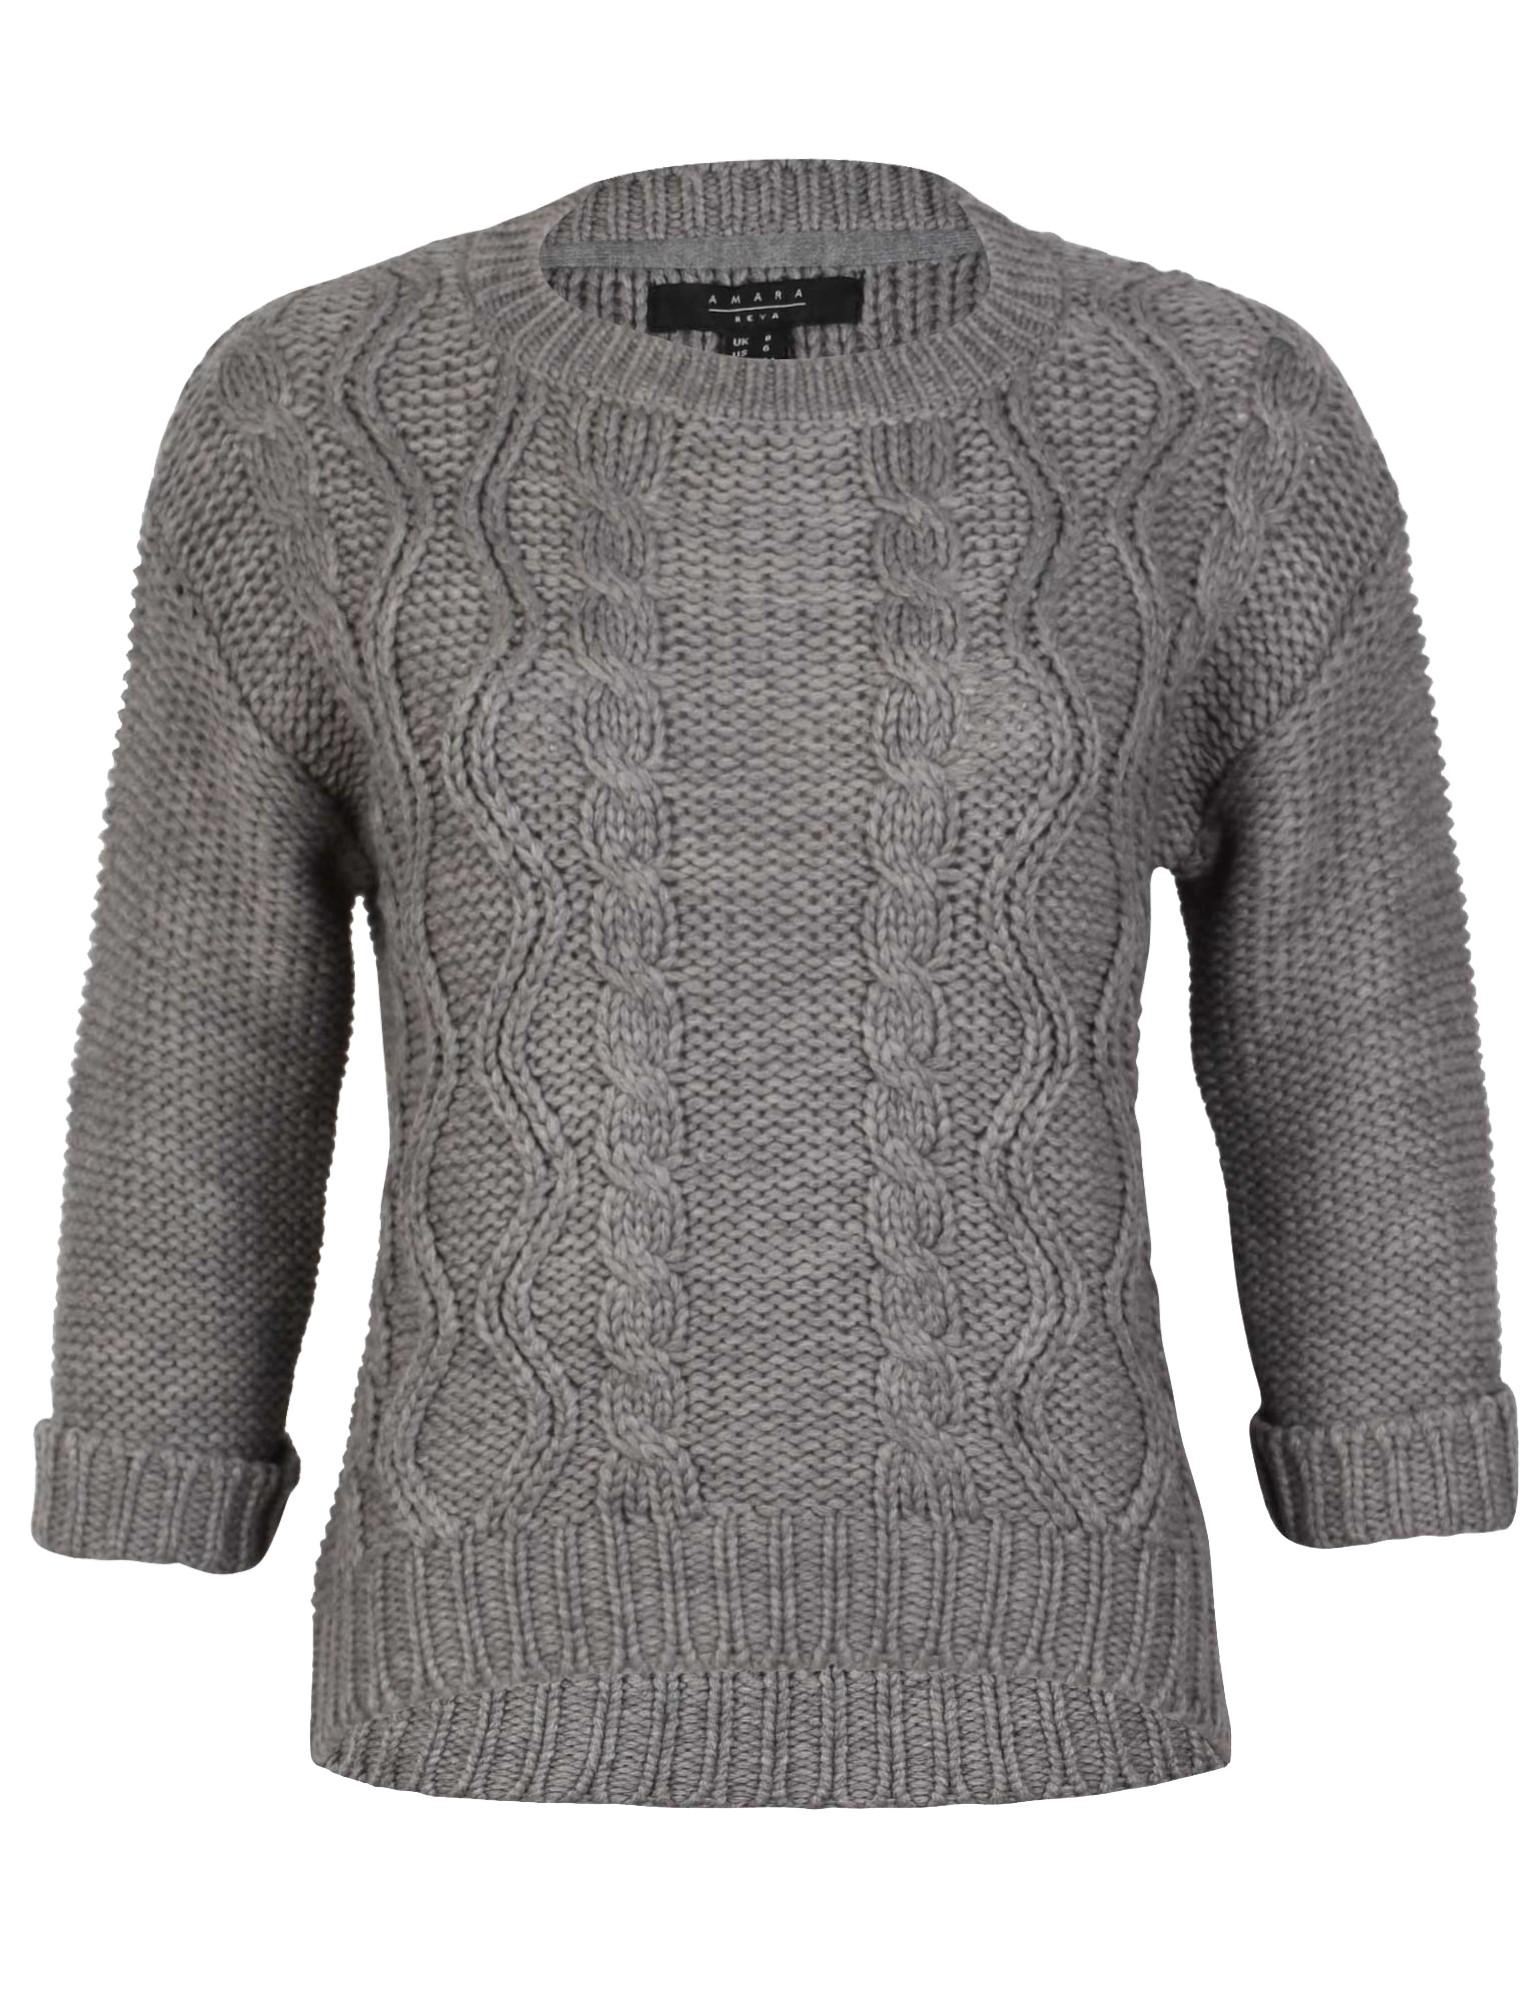 amara reya buttercup cable knit jumper chmyhmf